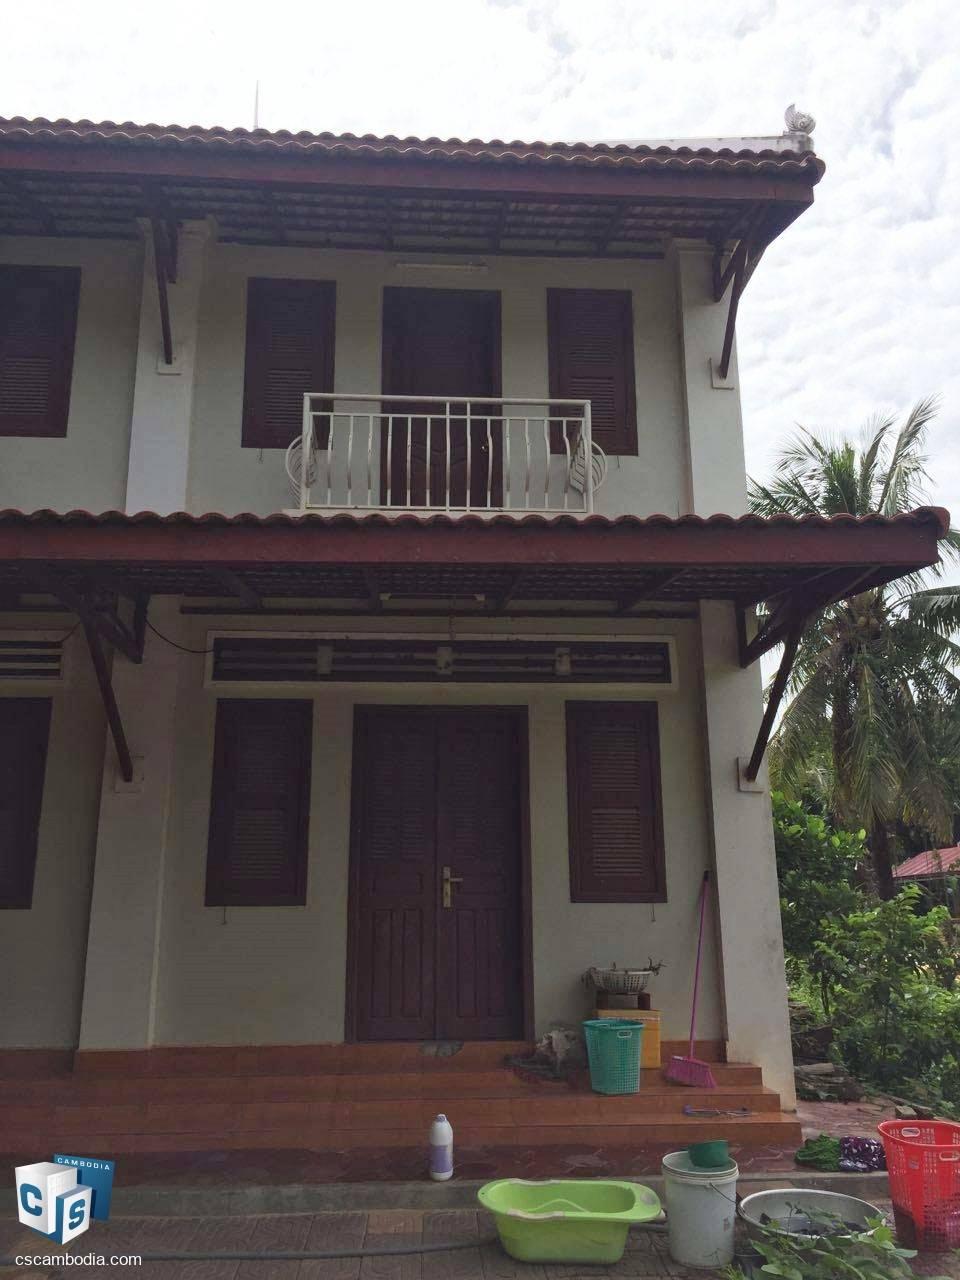 2 Bedroom House – For Rent – Wat Damnak Village – Sala Kamreuk Commune – Siem Reap